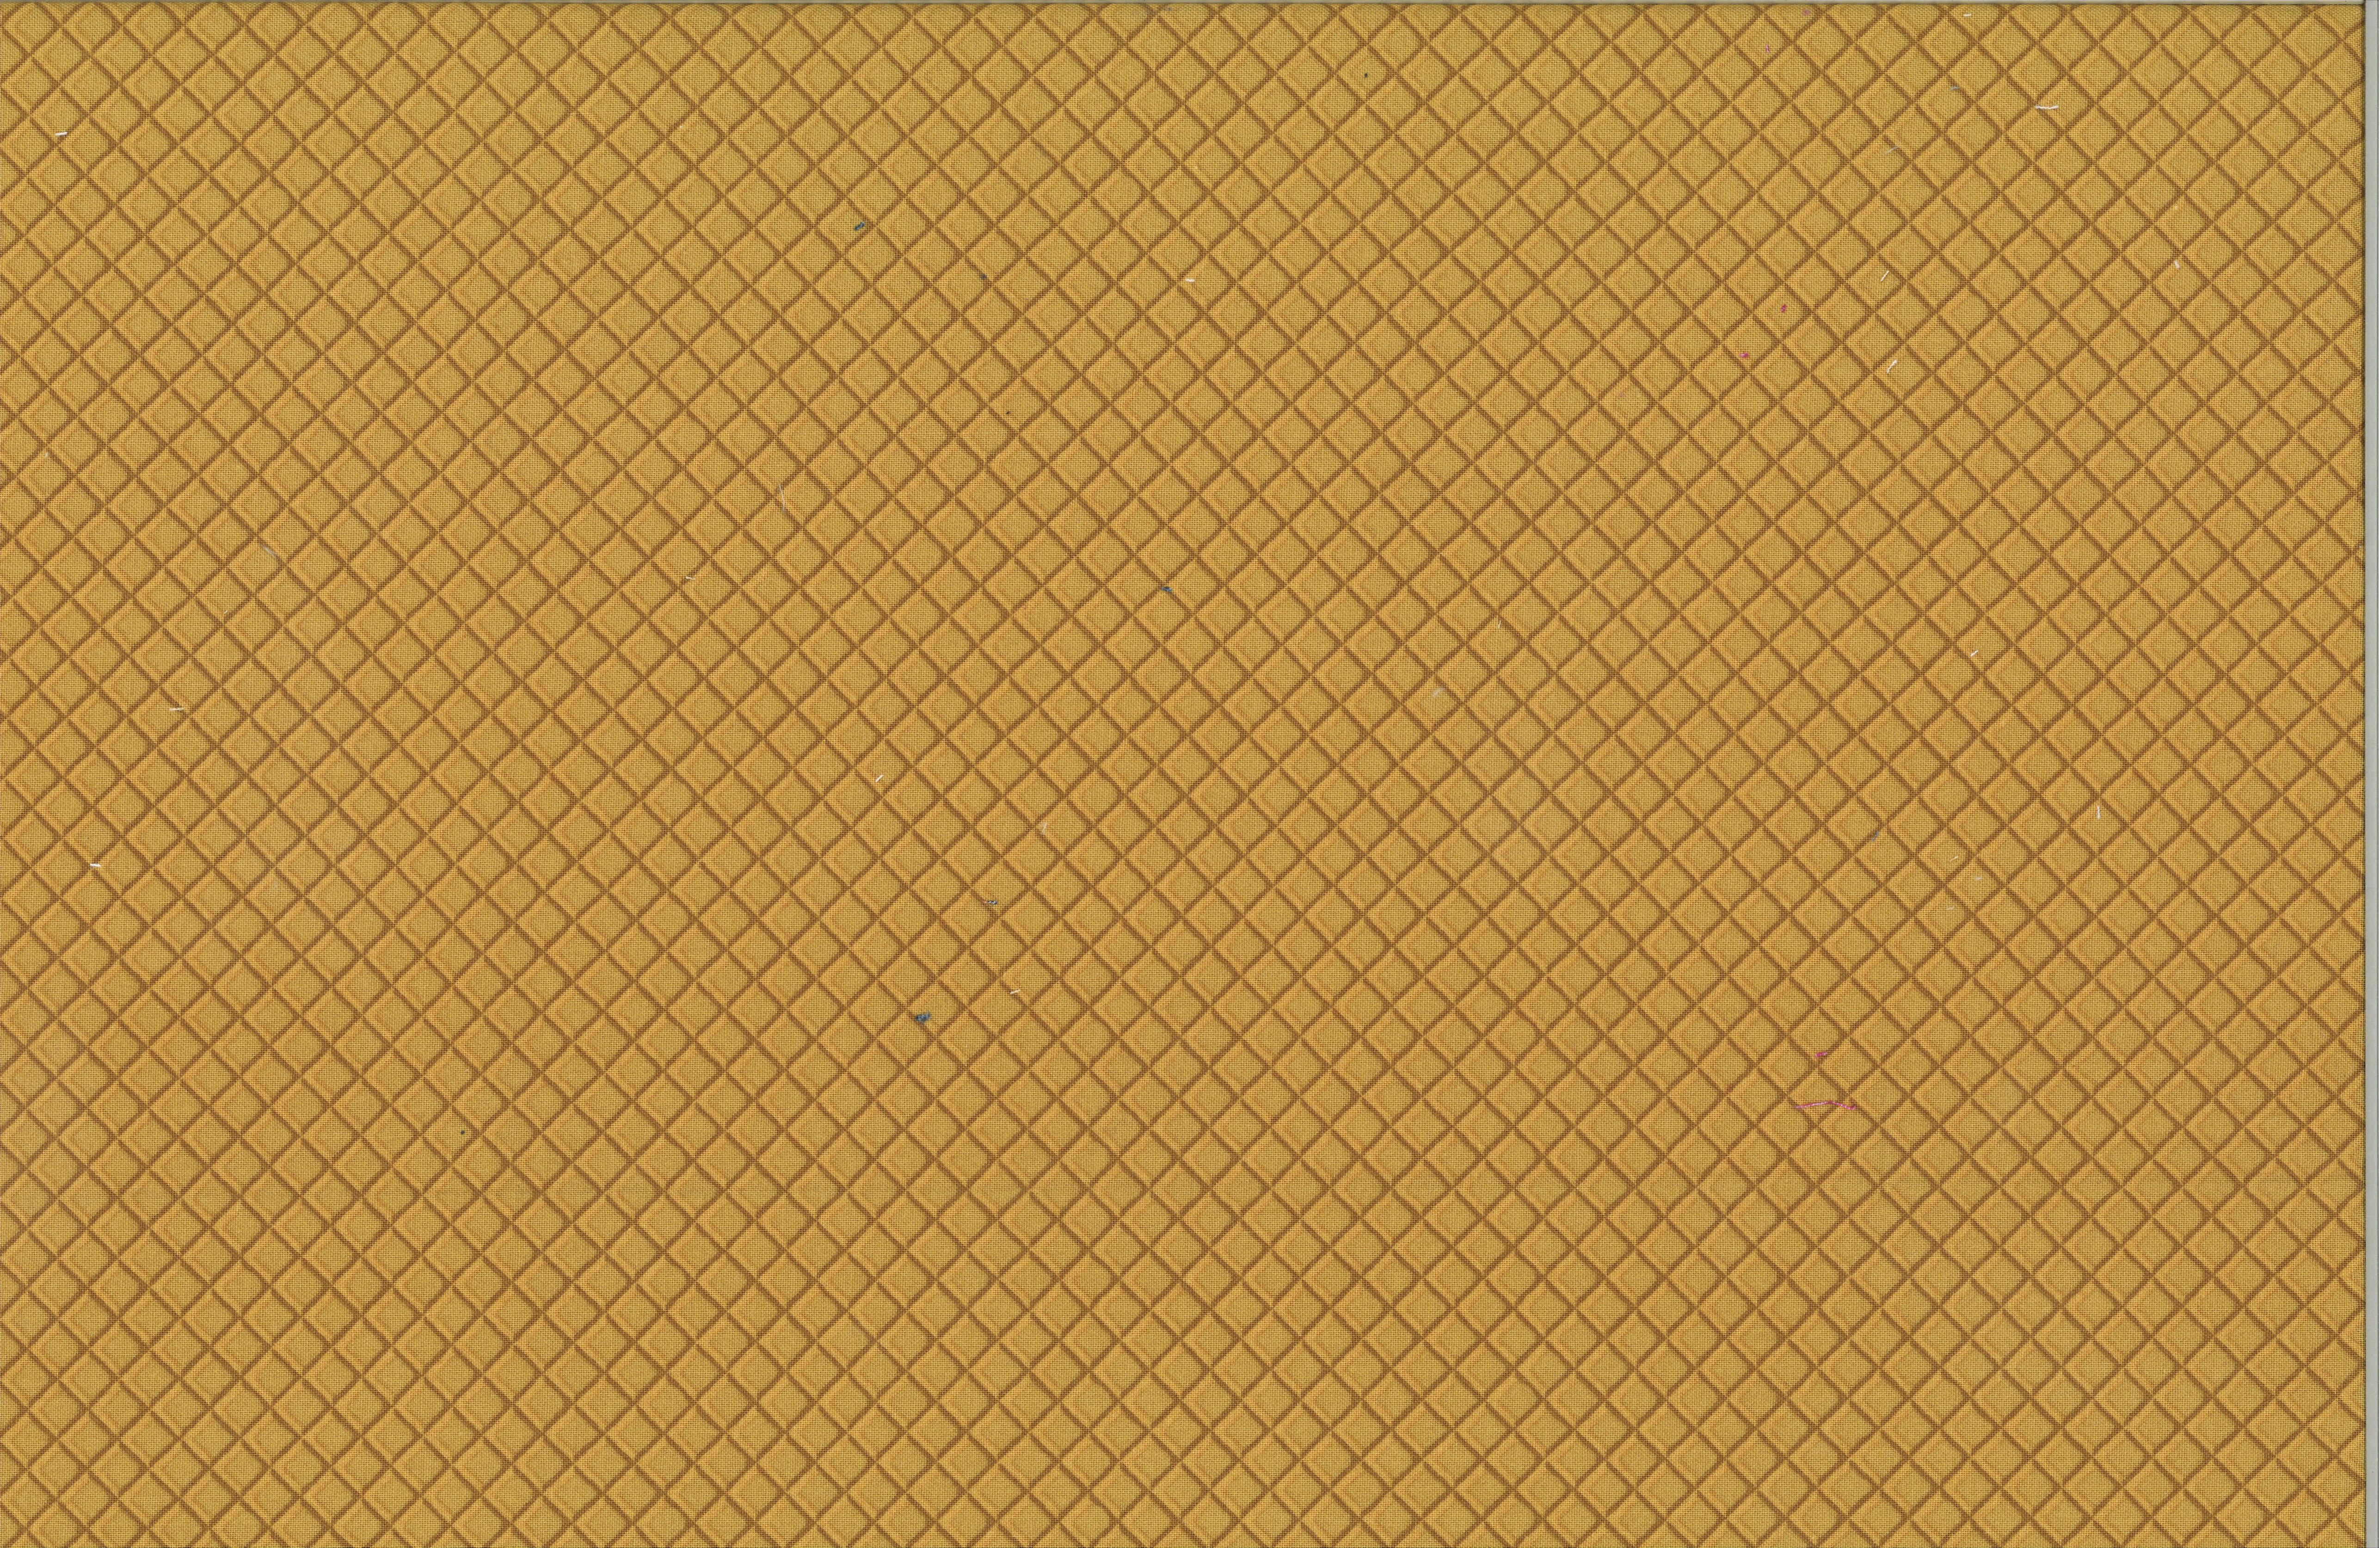 P4382-95-Mustard